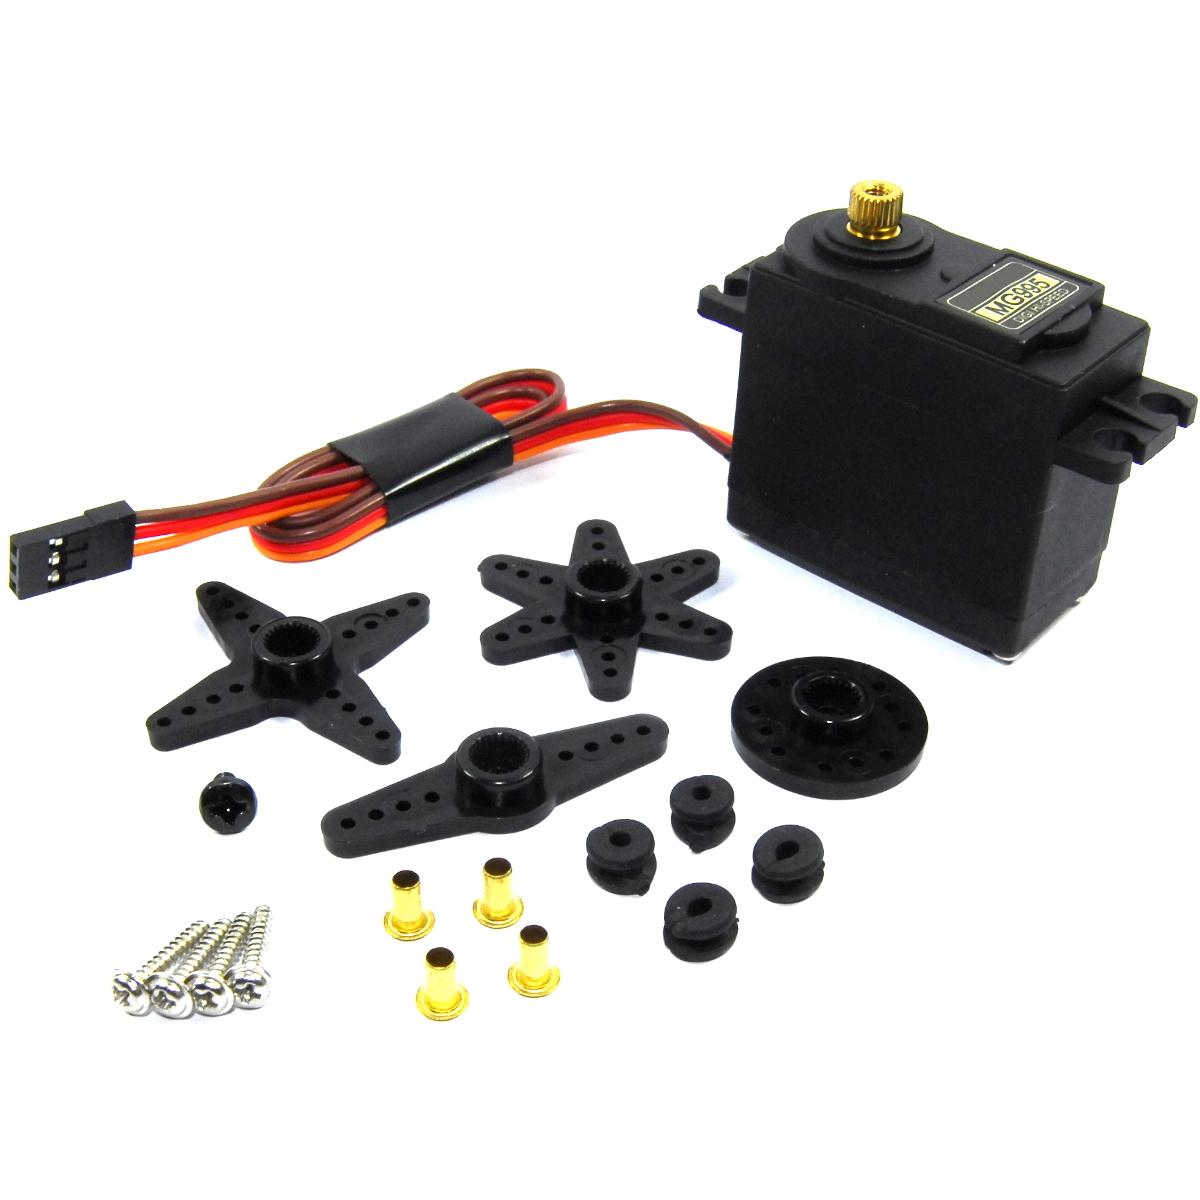 0443-1-5S Lipo Batterie Voltage Anzeige Indicator Brett